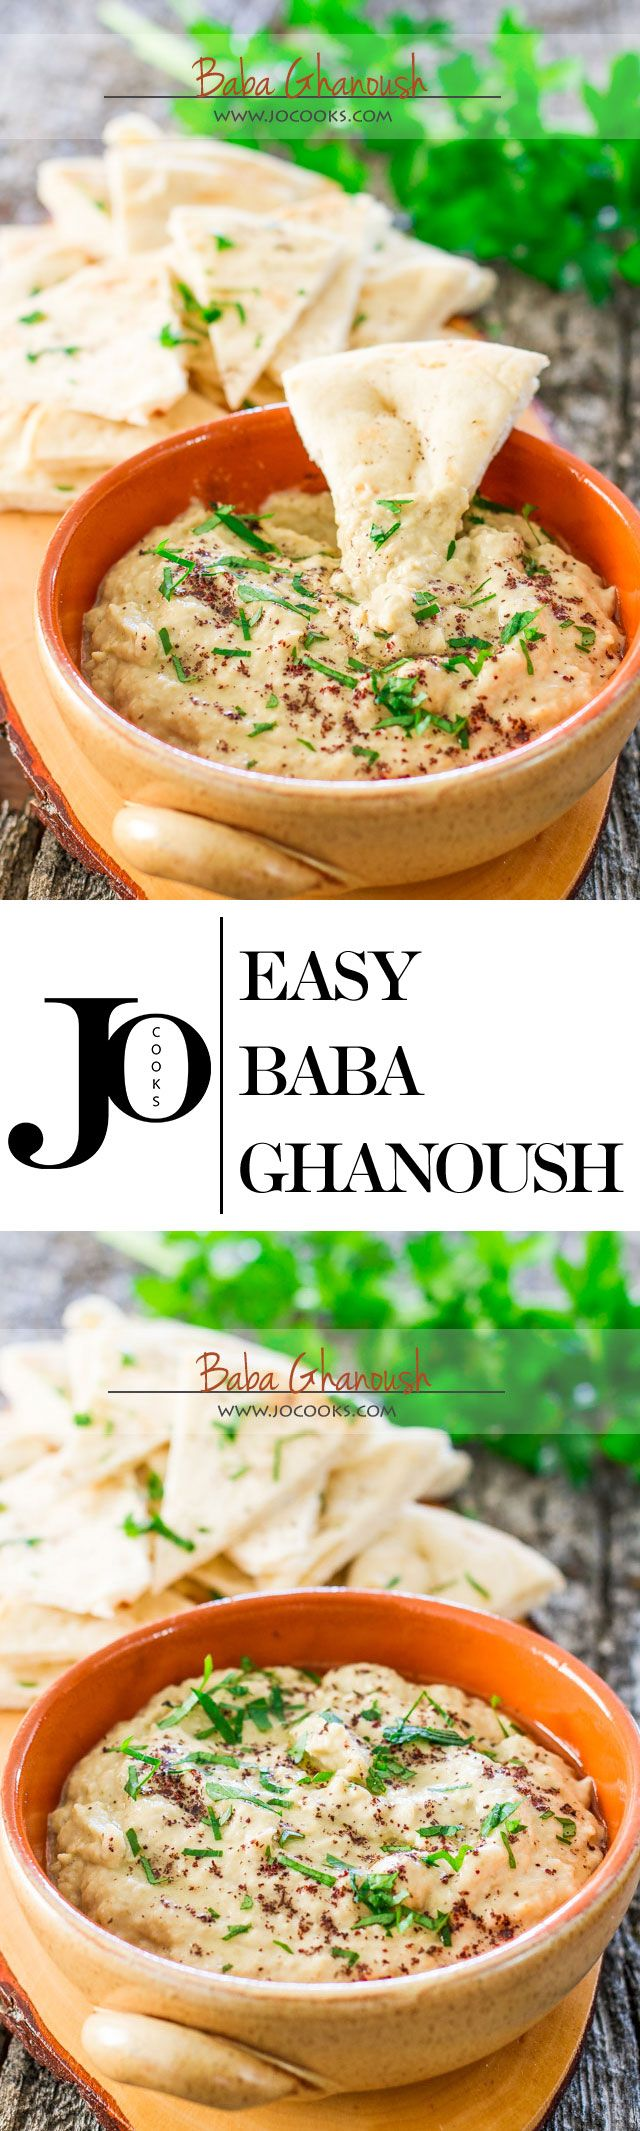 Baba ghanoush recipe tahini eggplants and juice baba ghanoush forumfinder Choice Image